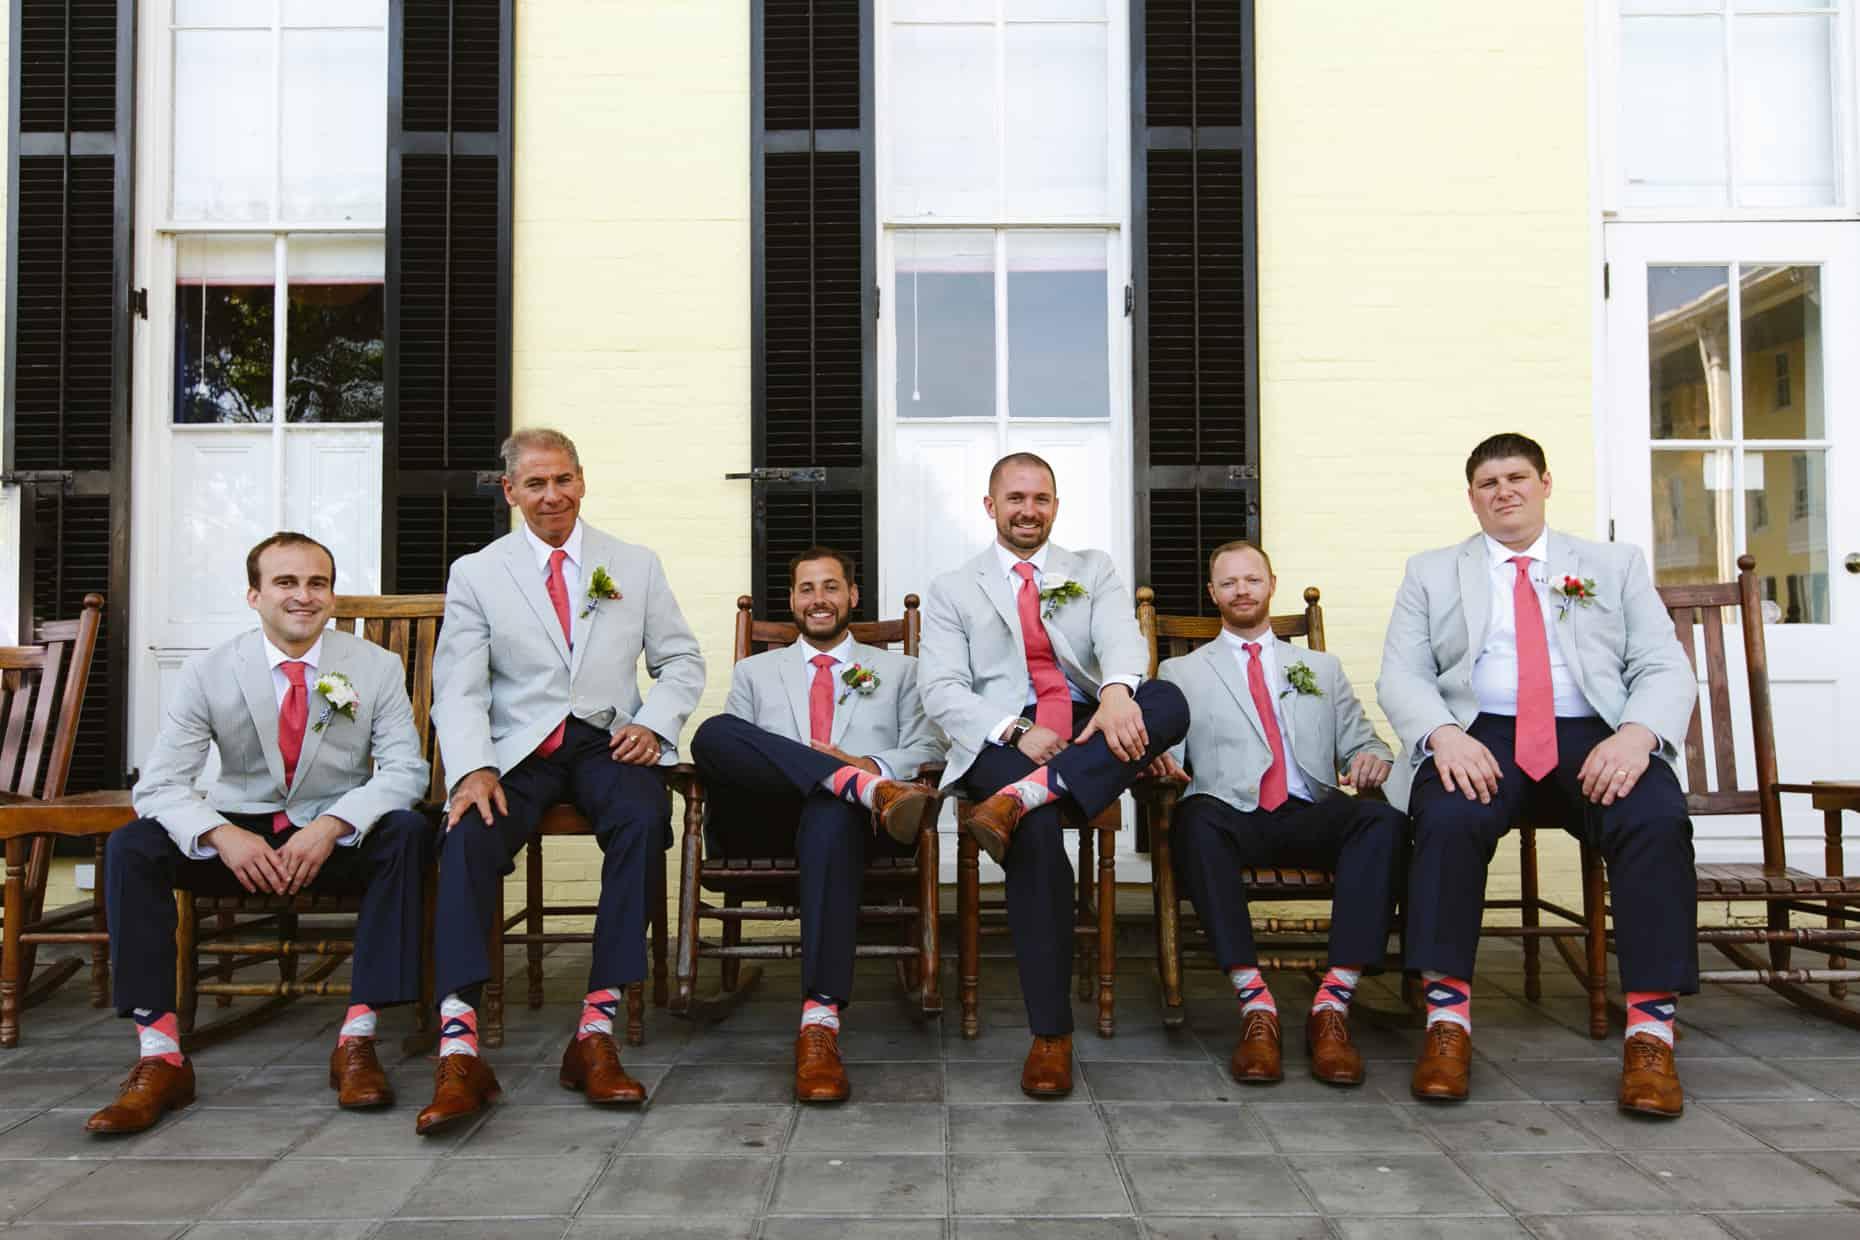 Cape May Wedding Groomsmen